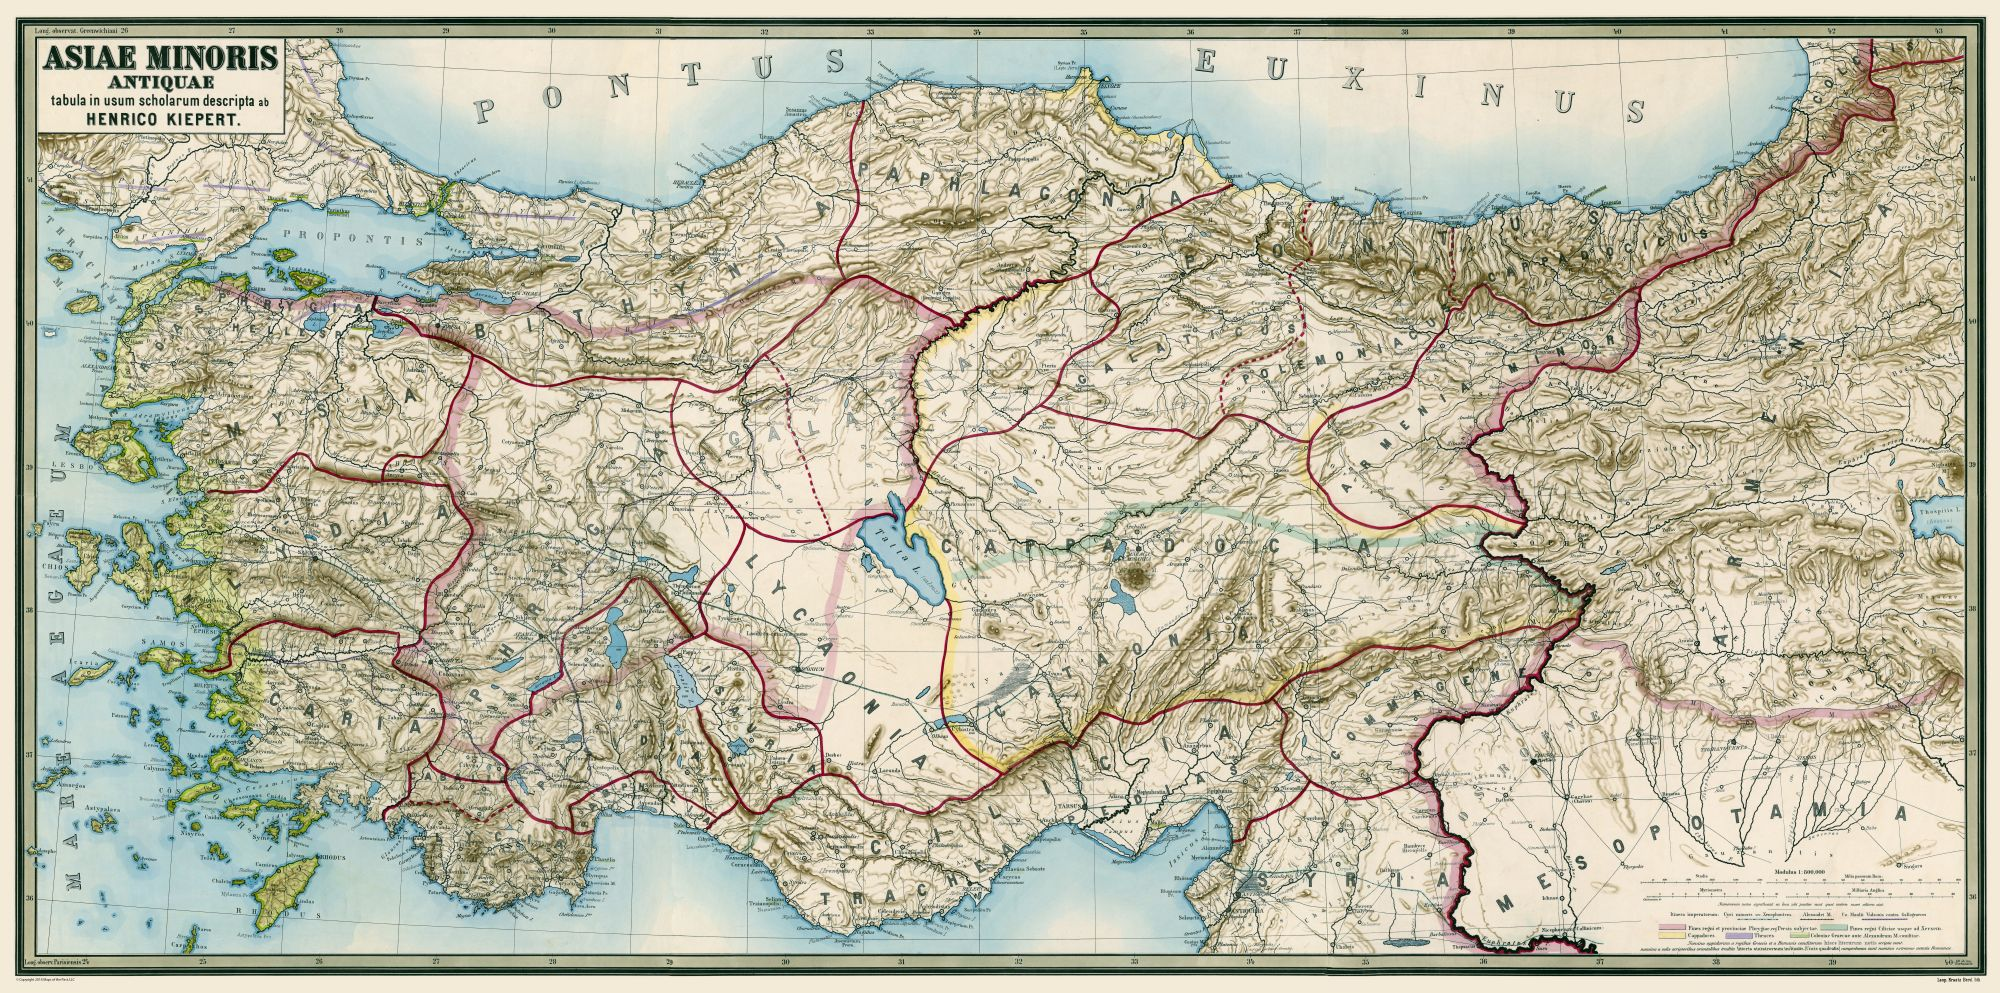 Map Of Asia Minor.International Map Ancient Asia Minor Kiepert 1888 46 33 X 23